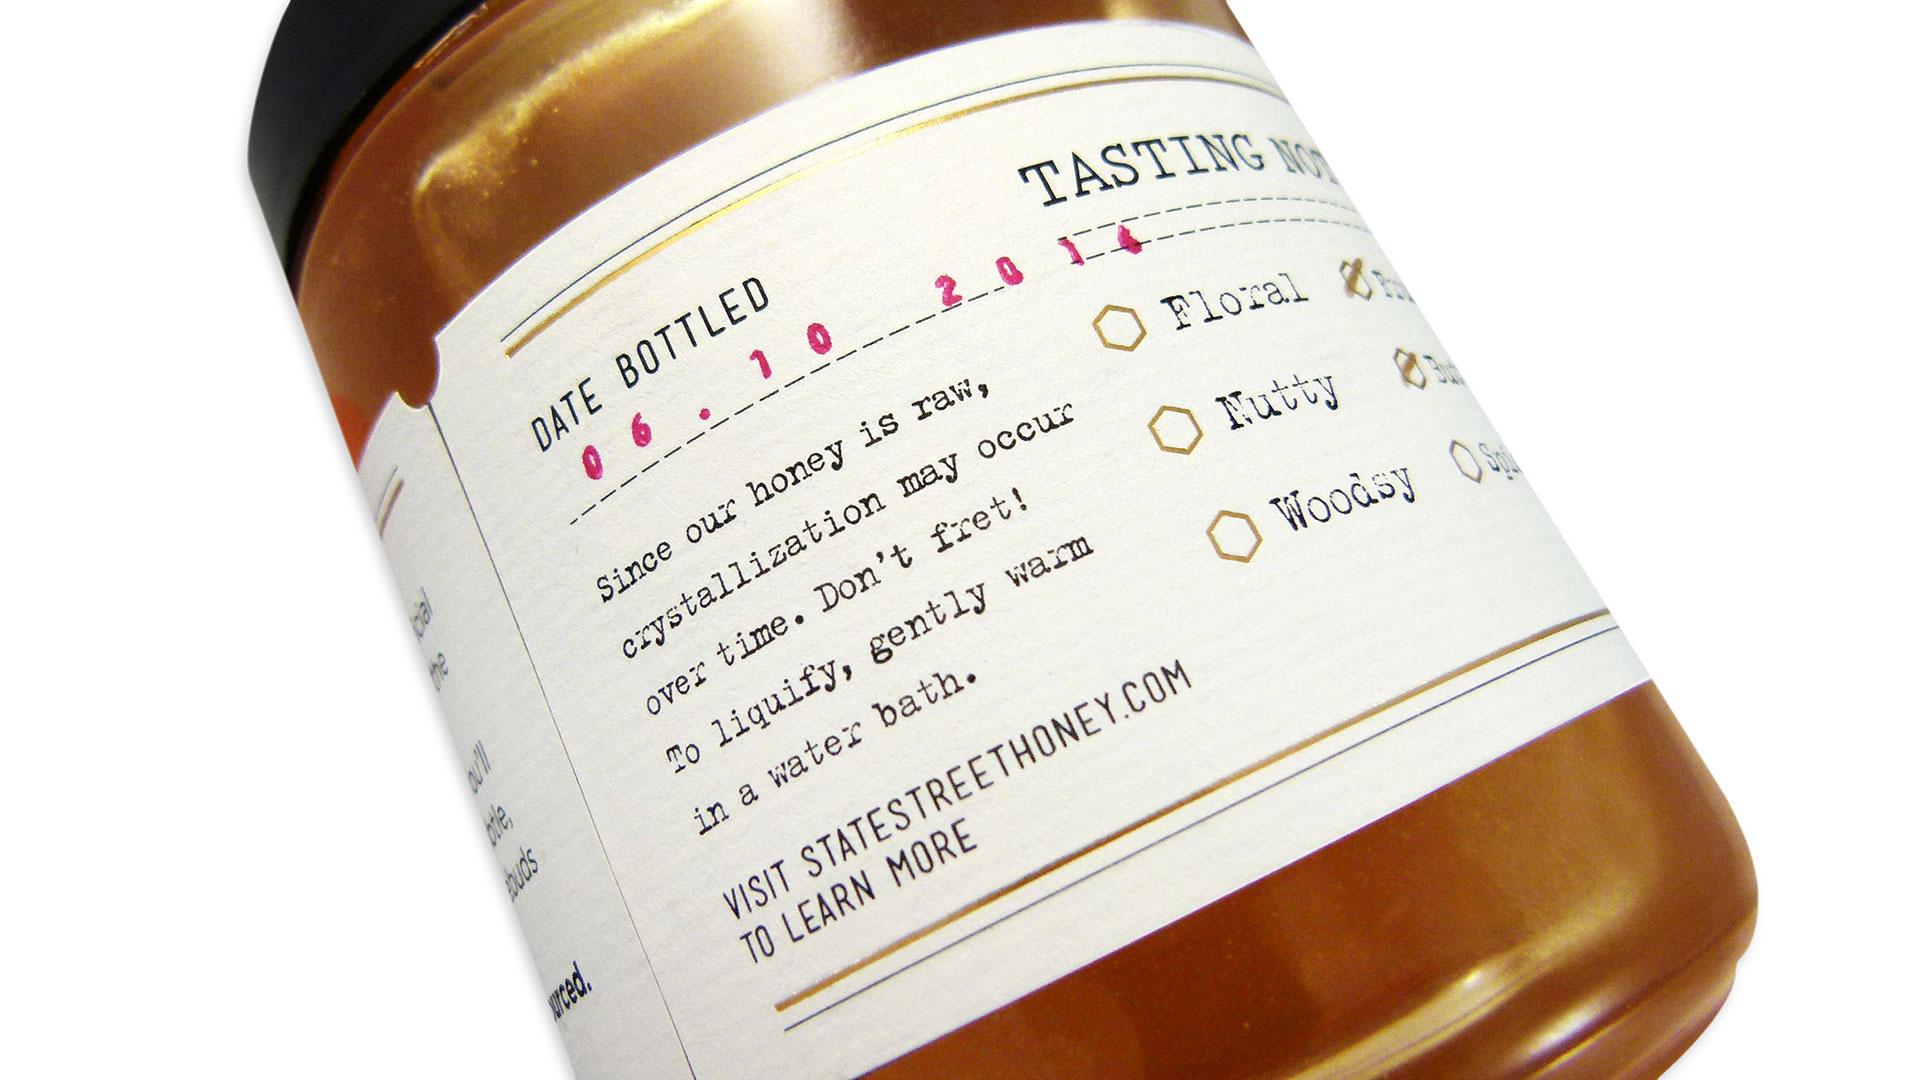 State Street Honey Packaging - PaperSpecs